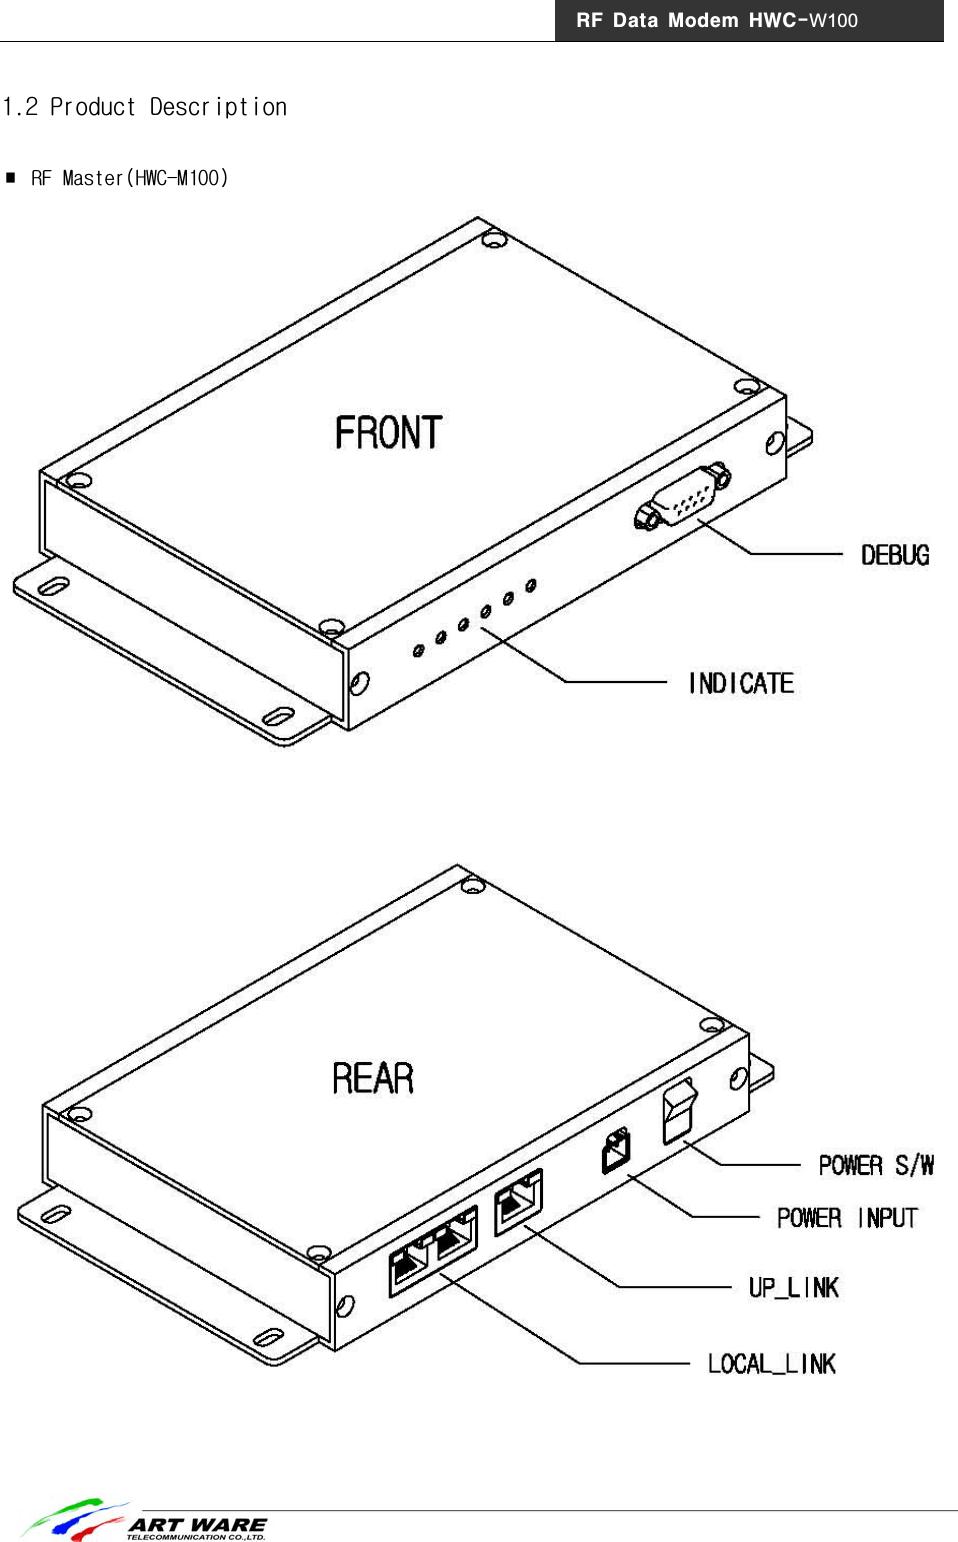 HYUNDAI ELEVATOR HWC-W100 RF Data Modem User Manual ZigBee